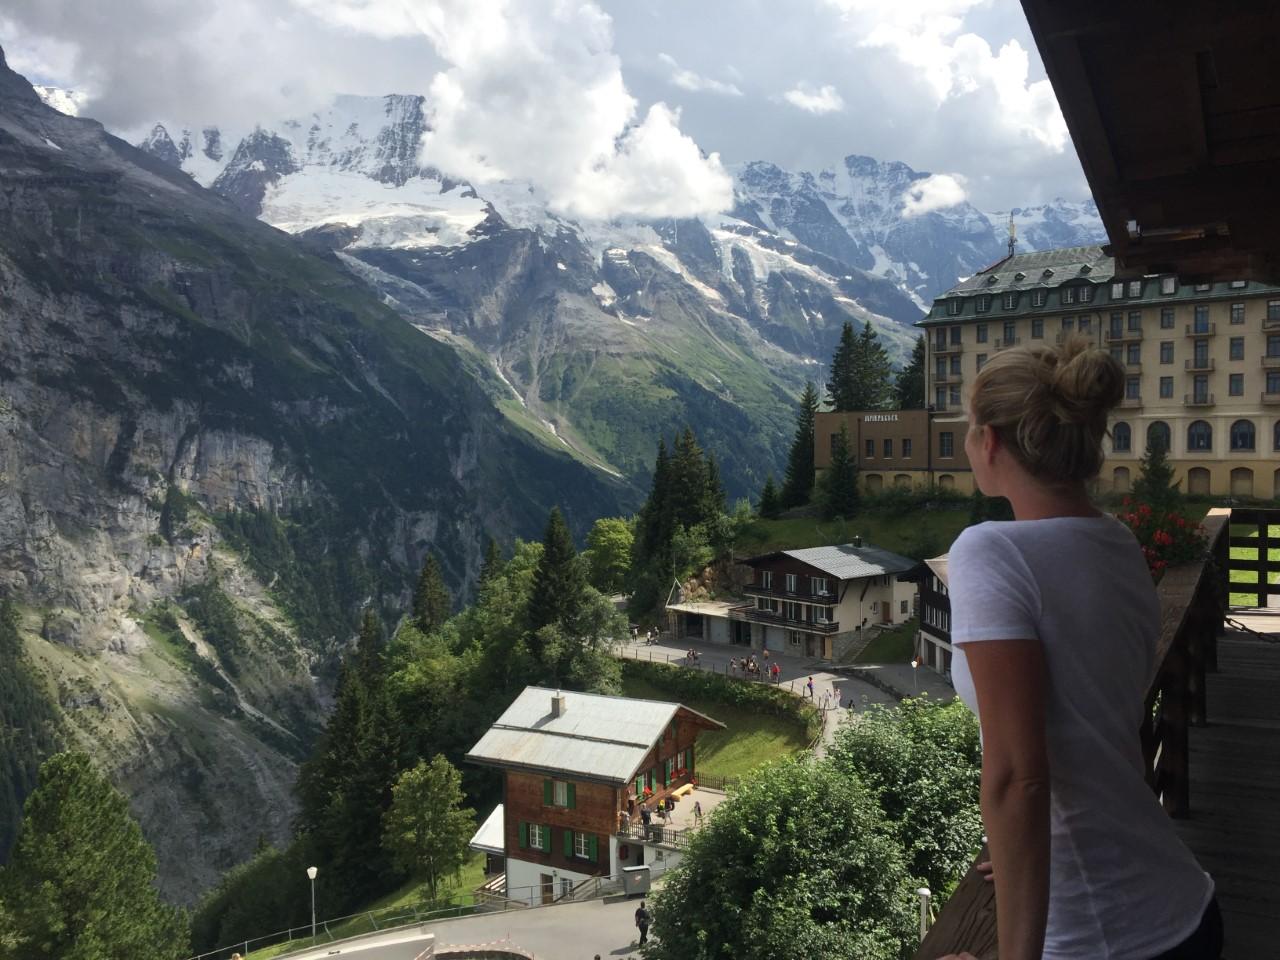 Sarah Arison on her honeymoon in the Swiss Alps, 2016.